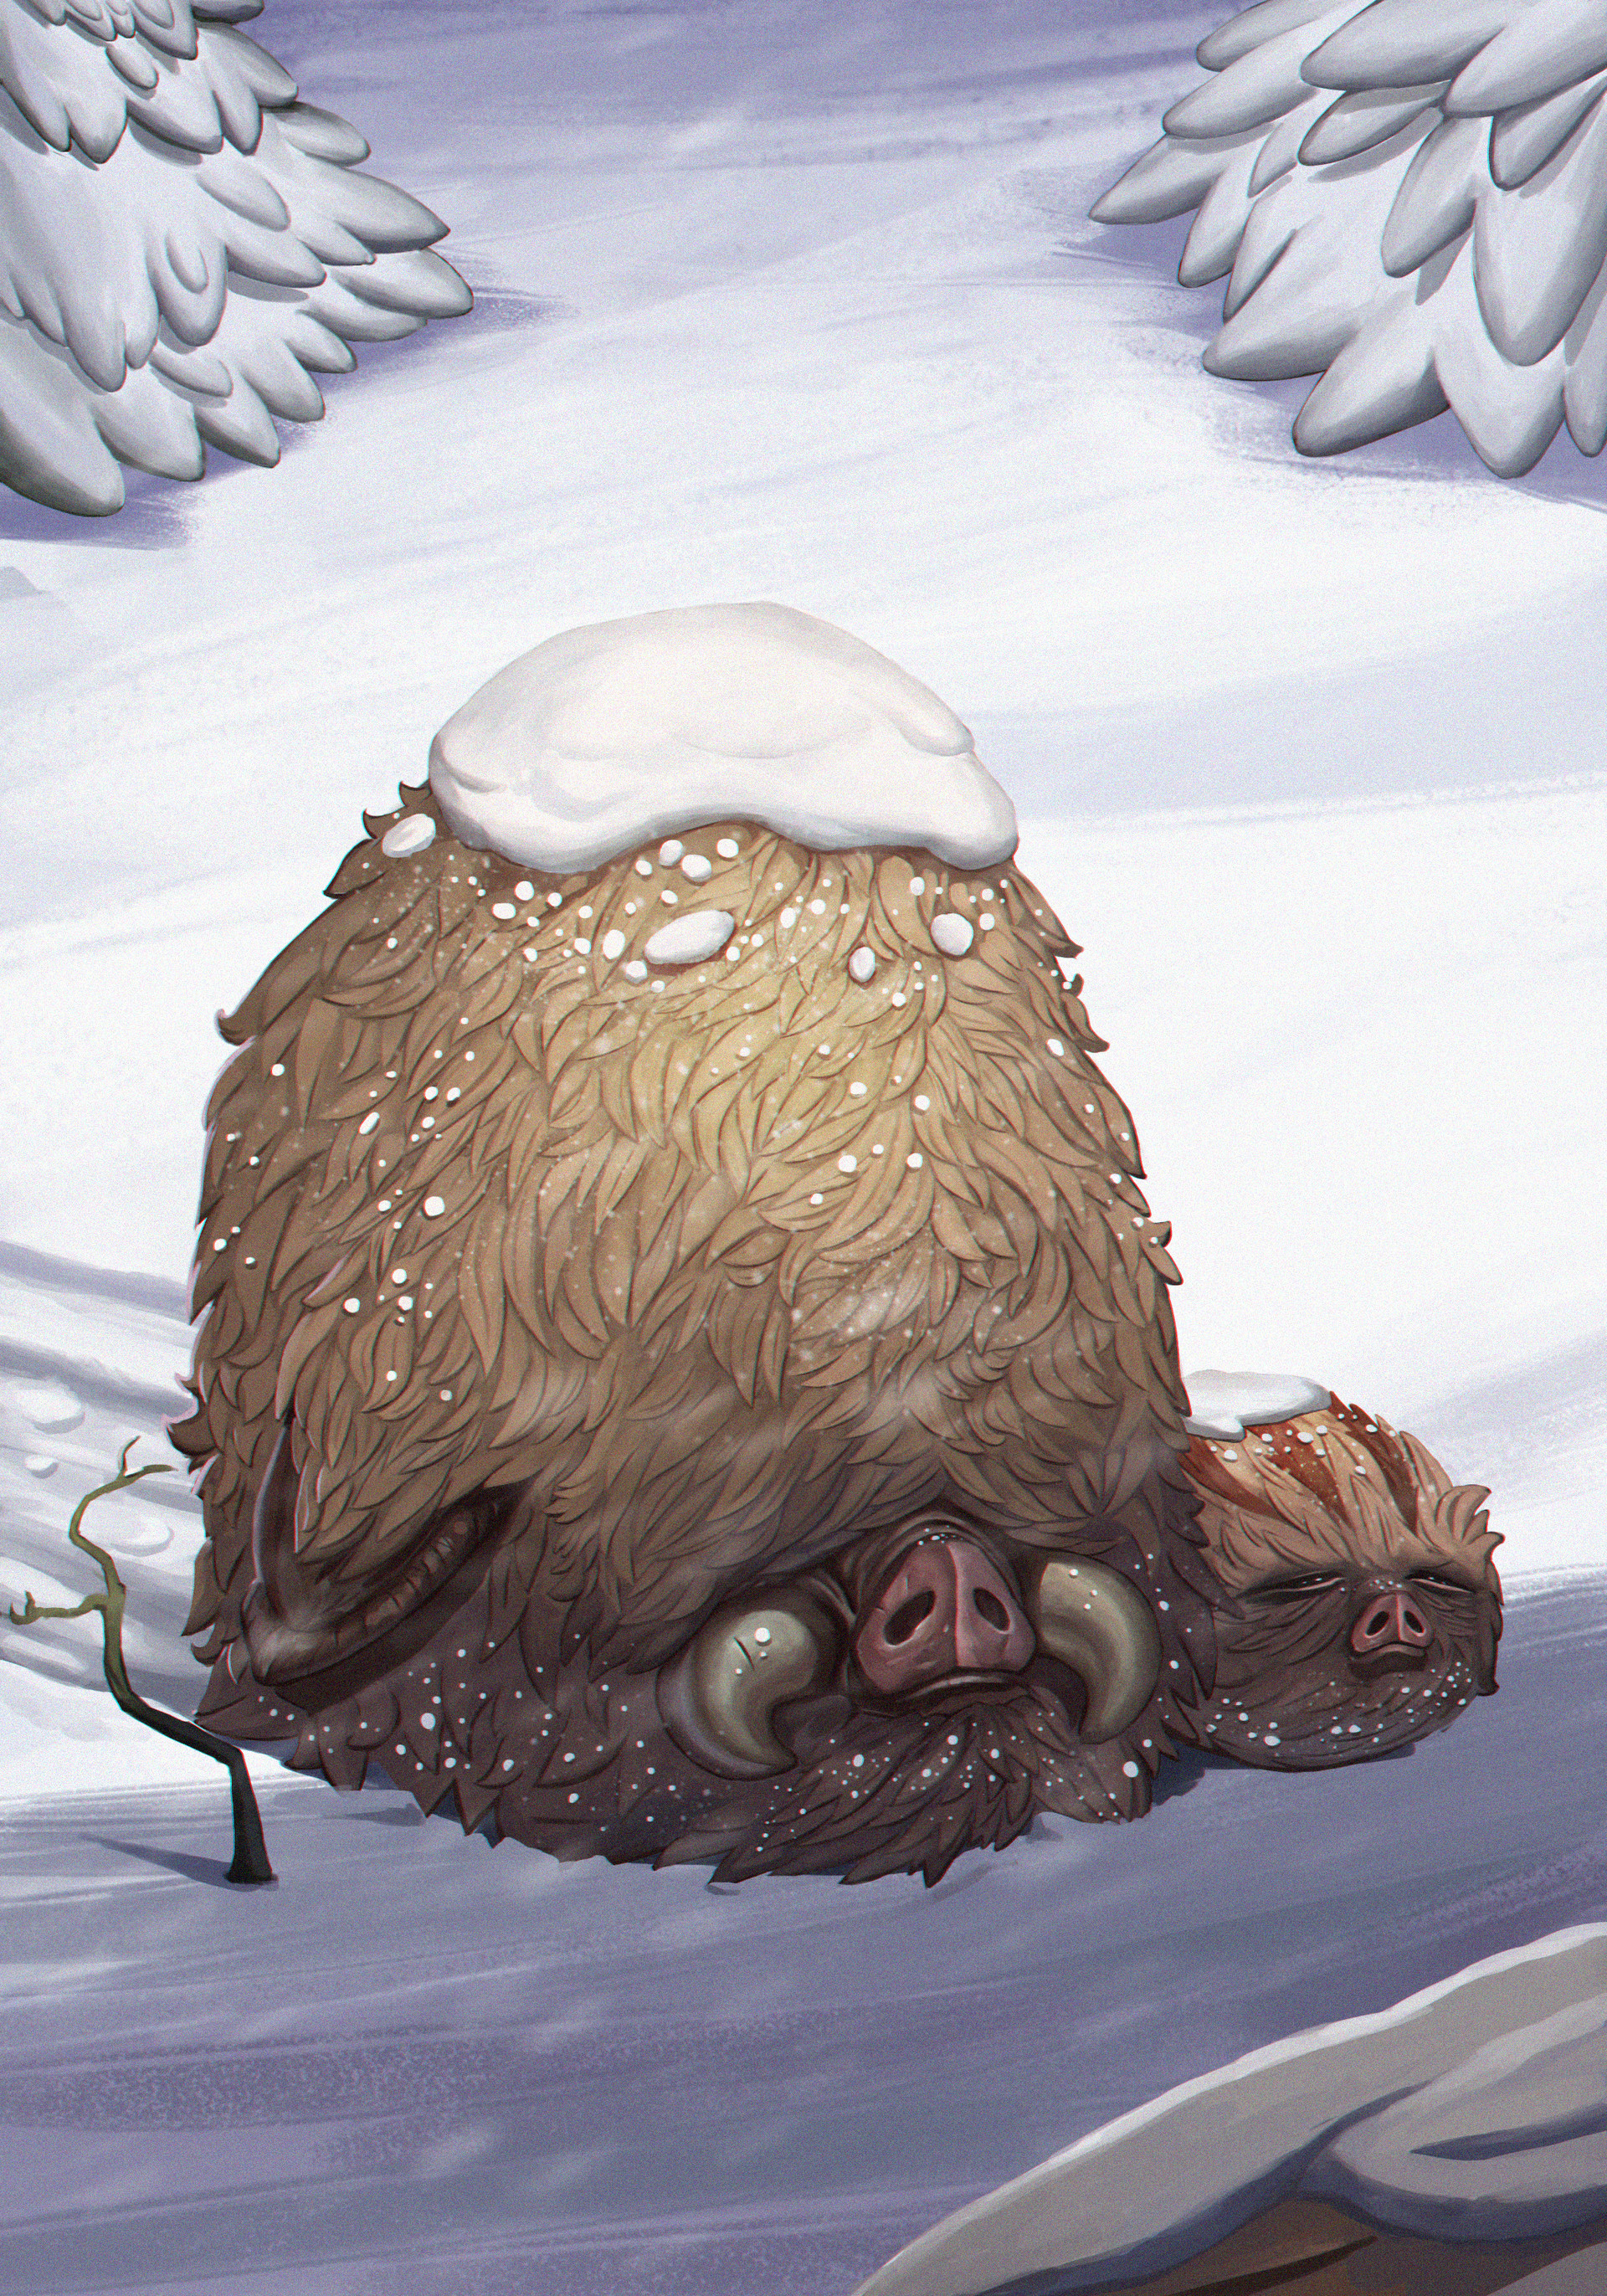 Swinub and Polyswine